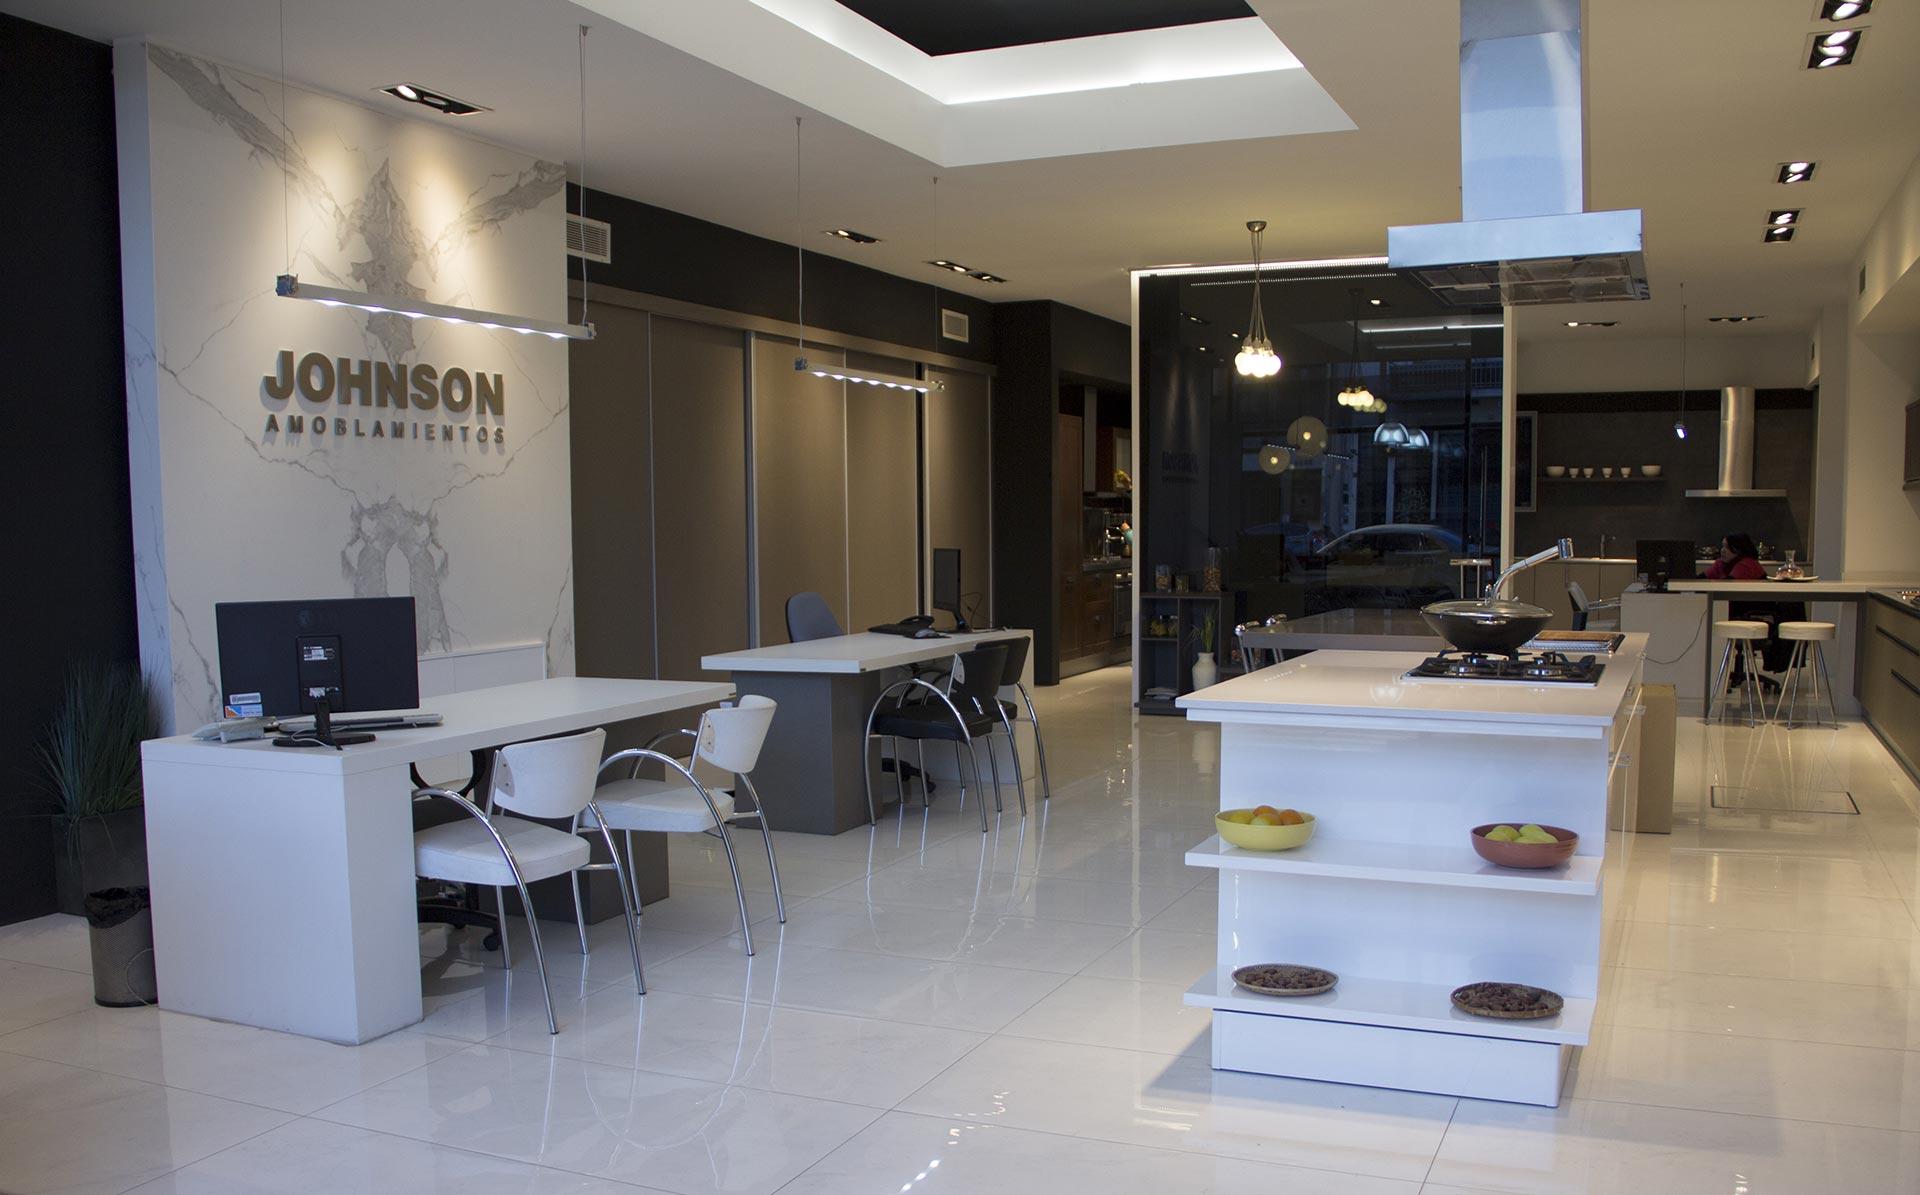 Muebles De Cocina Johnson Fotos Azarak Com Ideas Interesantes  # Muebles Johnson Rosario